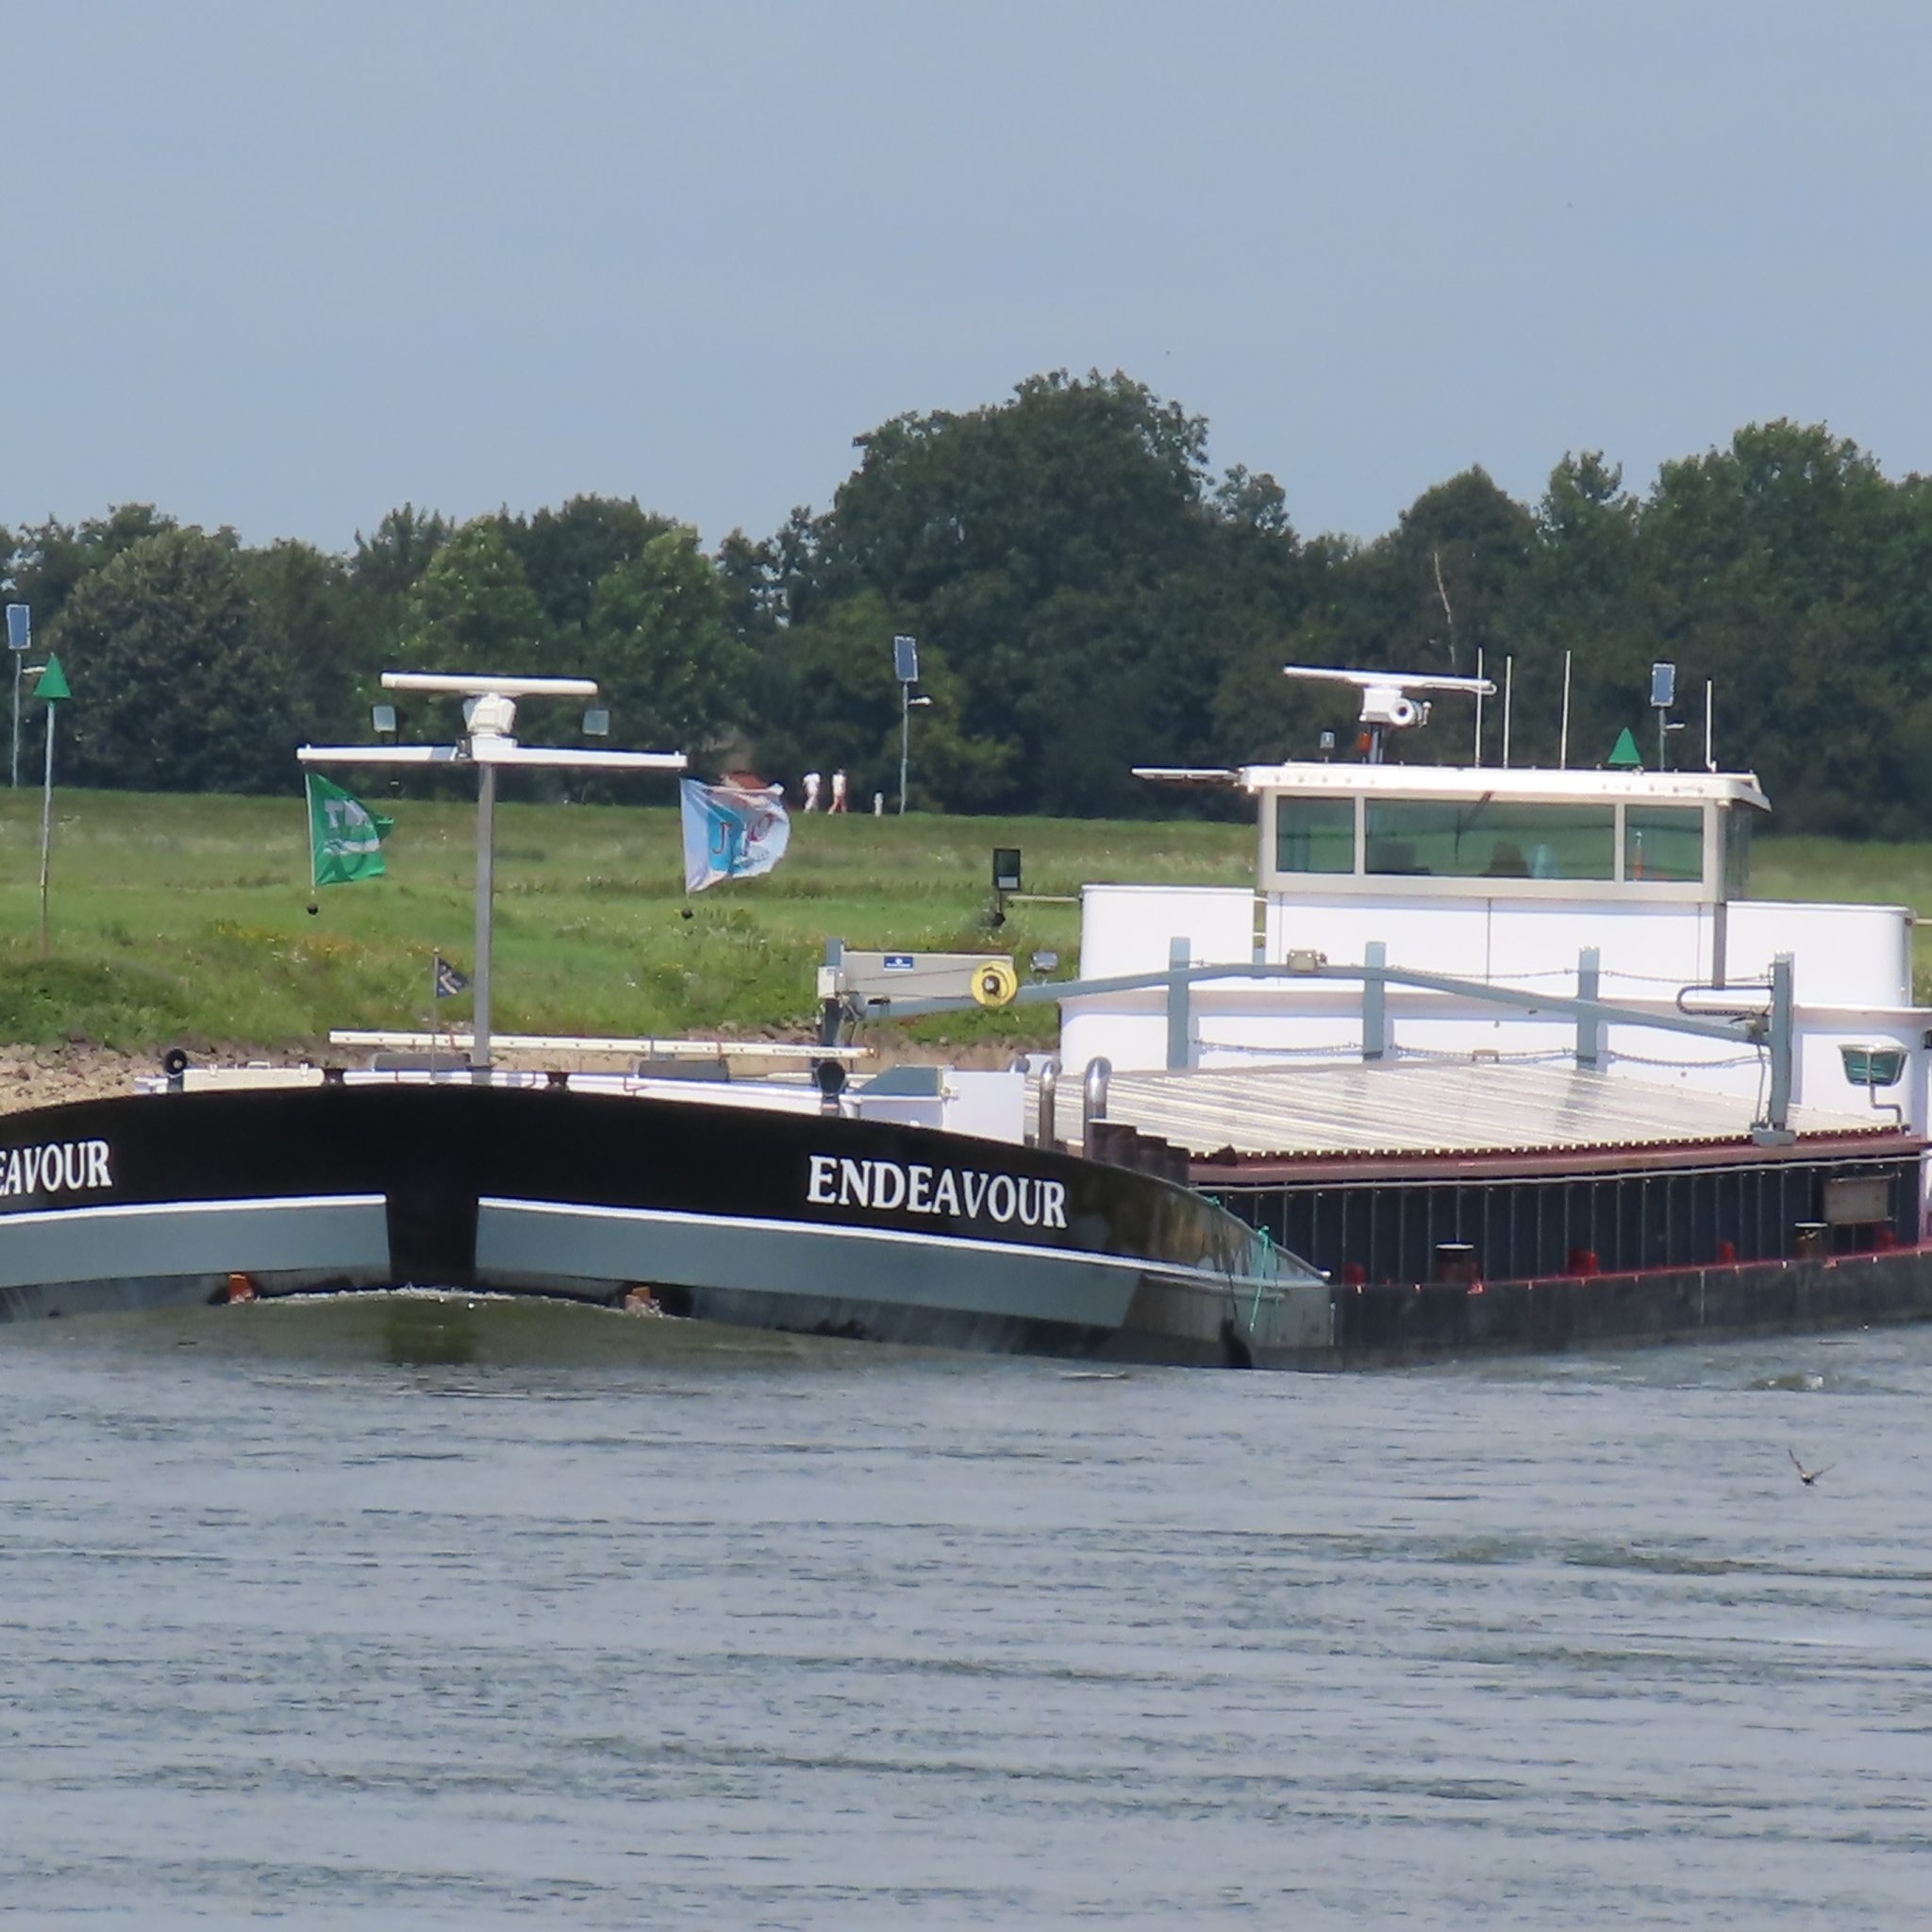 Hoekstra BV heeft de Endeavour verkocht naar Hendrik Ido Ambacht. (Foto R .H. Mulder)